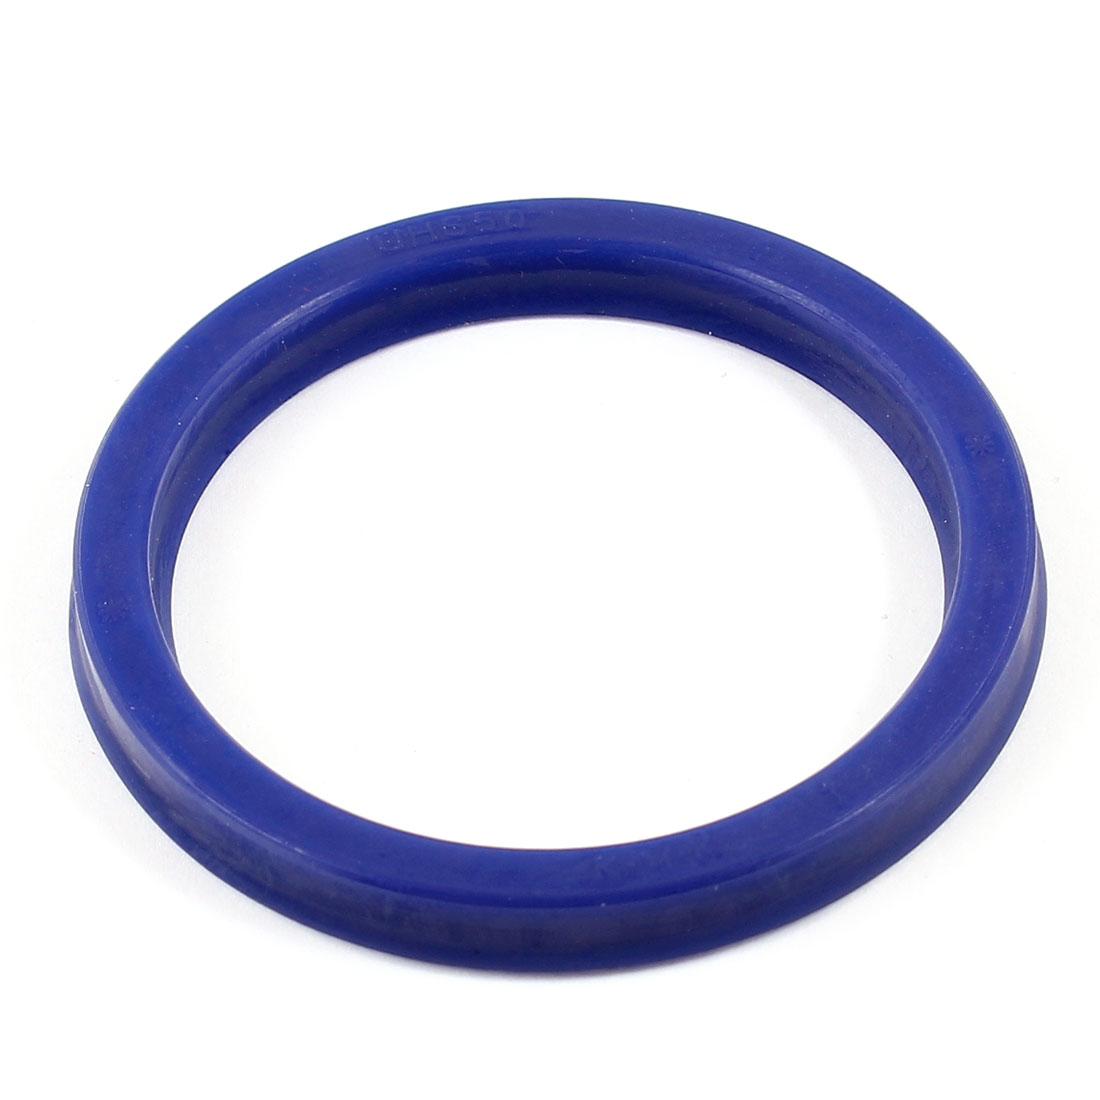 60mm x 48mm x 6mm Grooving Rubber O Ring Skeleton Oil Seal Gasket Blue